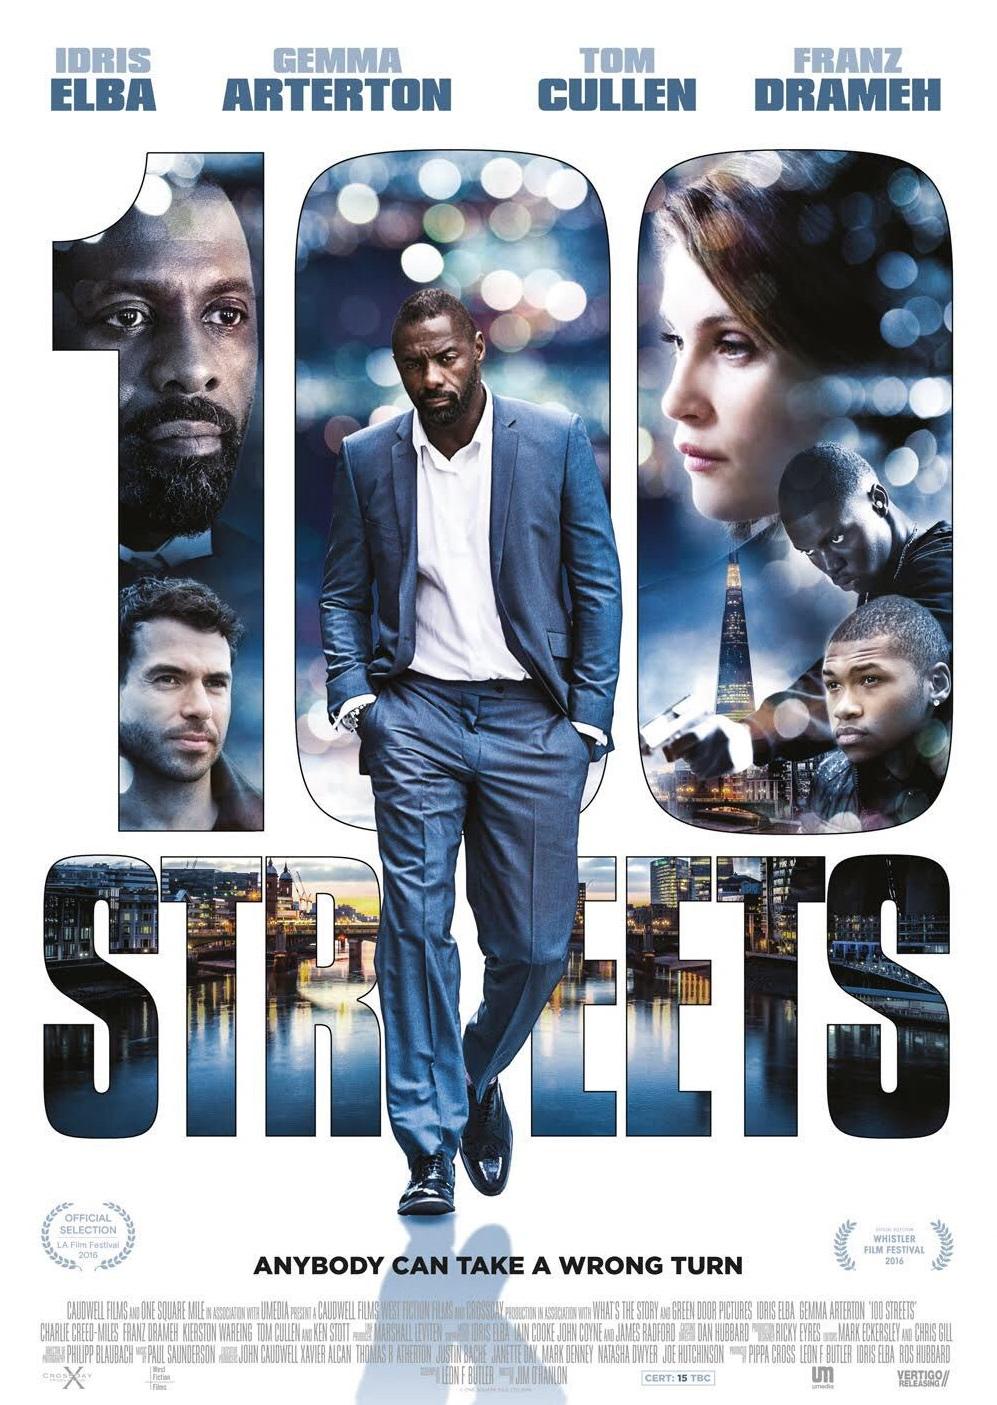 Idris Elba in indie drama '100 Streets'